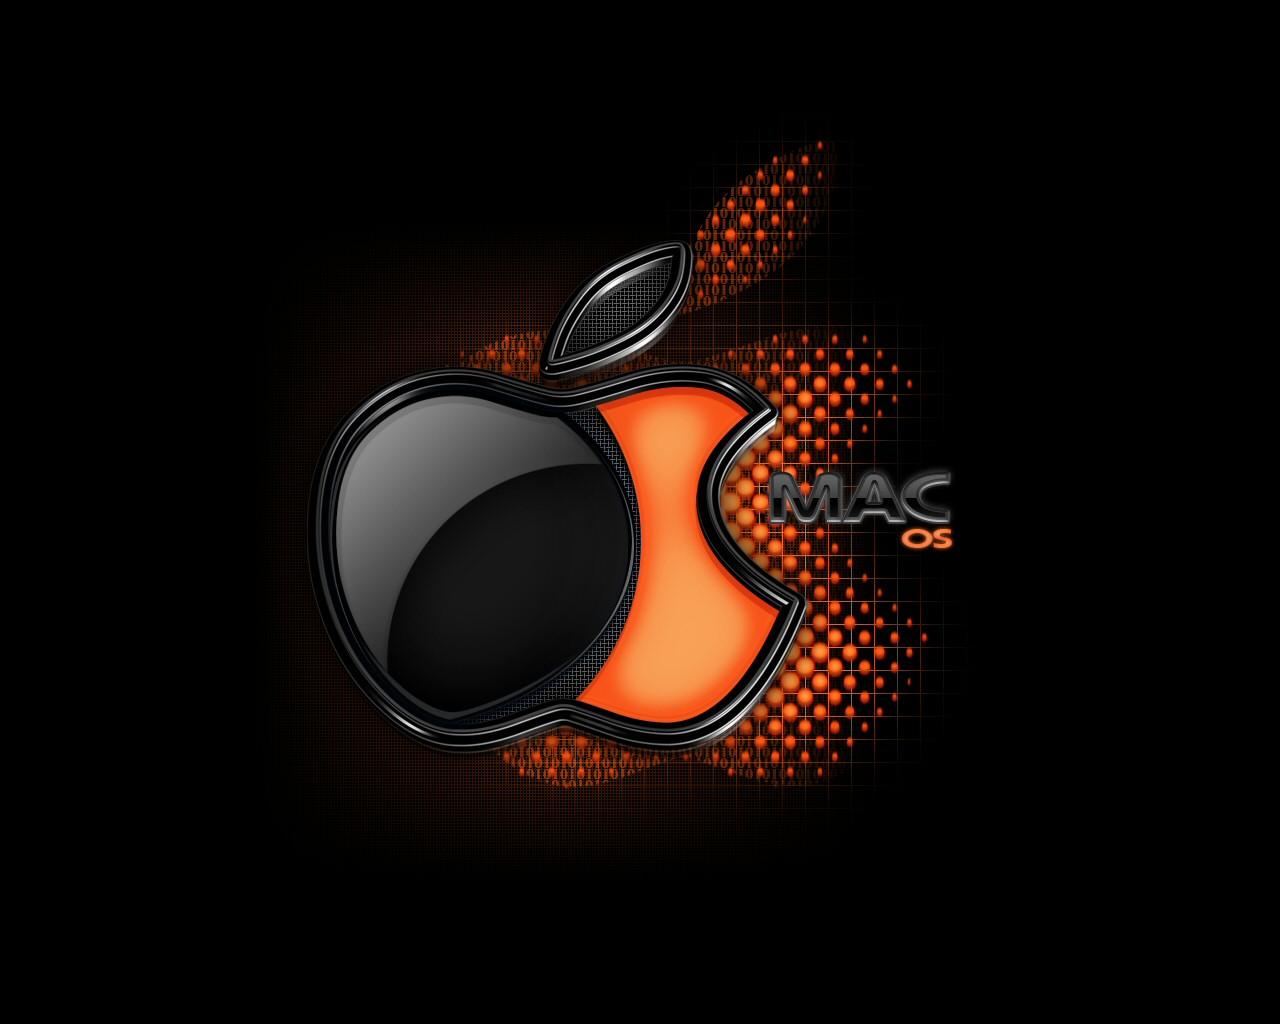 Apple Mac Wallpapers HD Nice Wallpapers 1280x1024